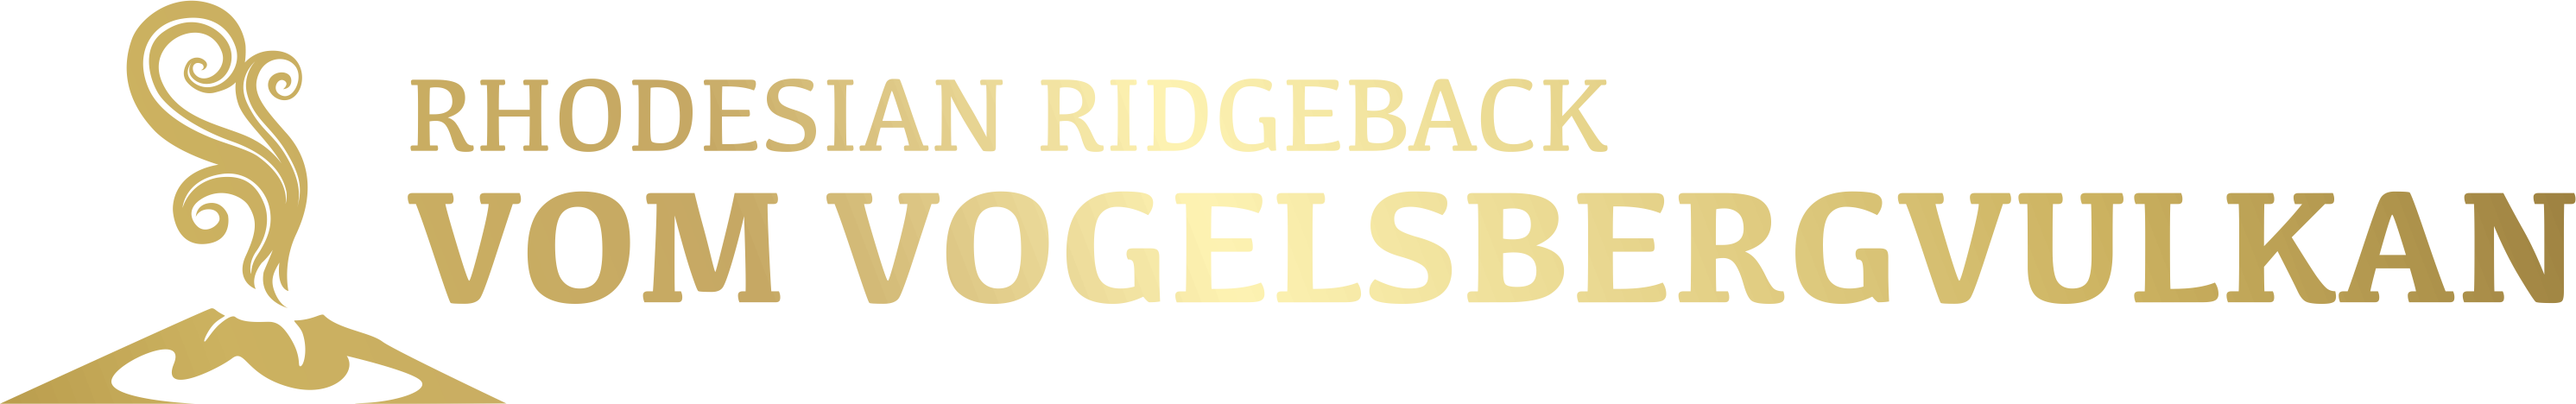 Kennel Rhodesian Ridgeback